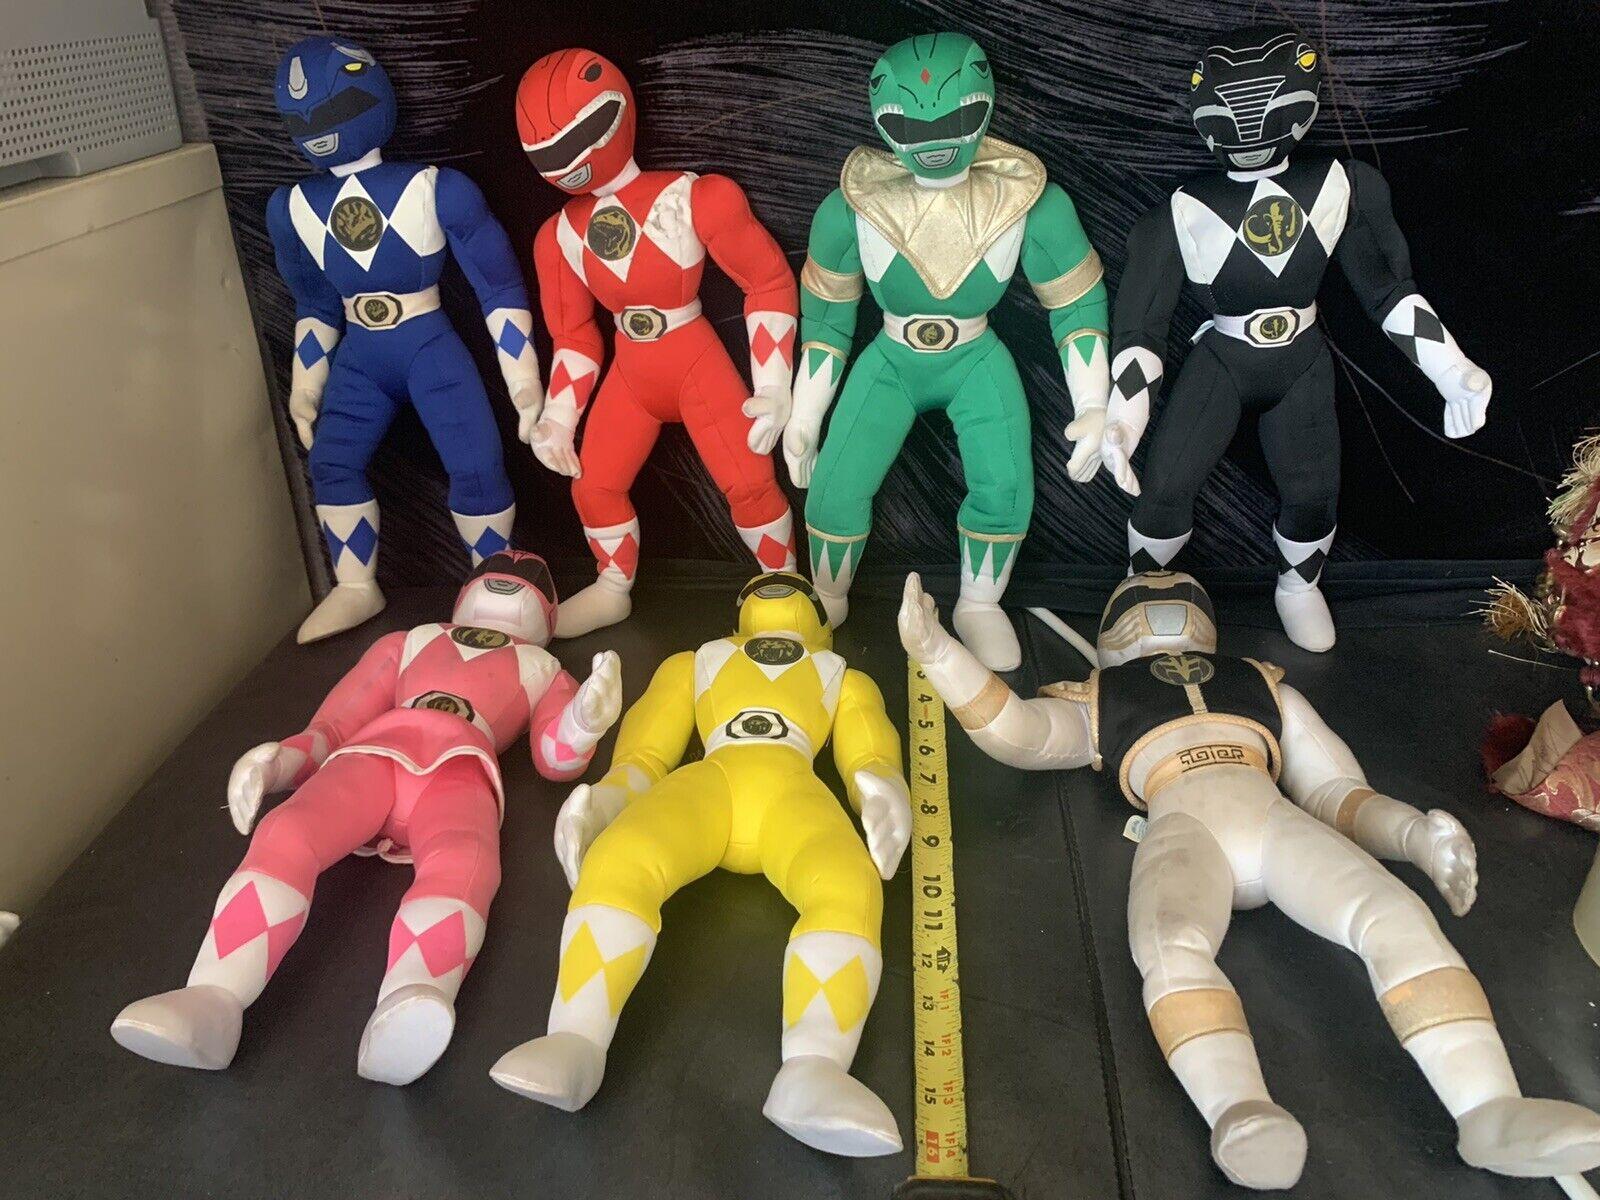 Lote de (7) Mighty Morphin Power Rangers-Niño Dimention - 18 pulgadas -1994 - difícil de encontrar